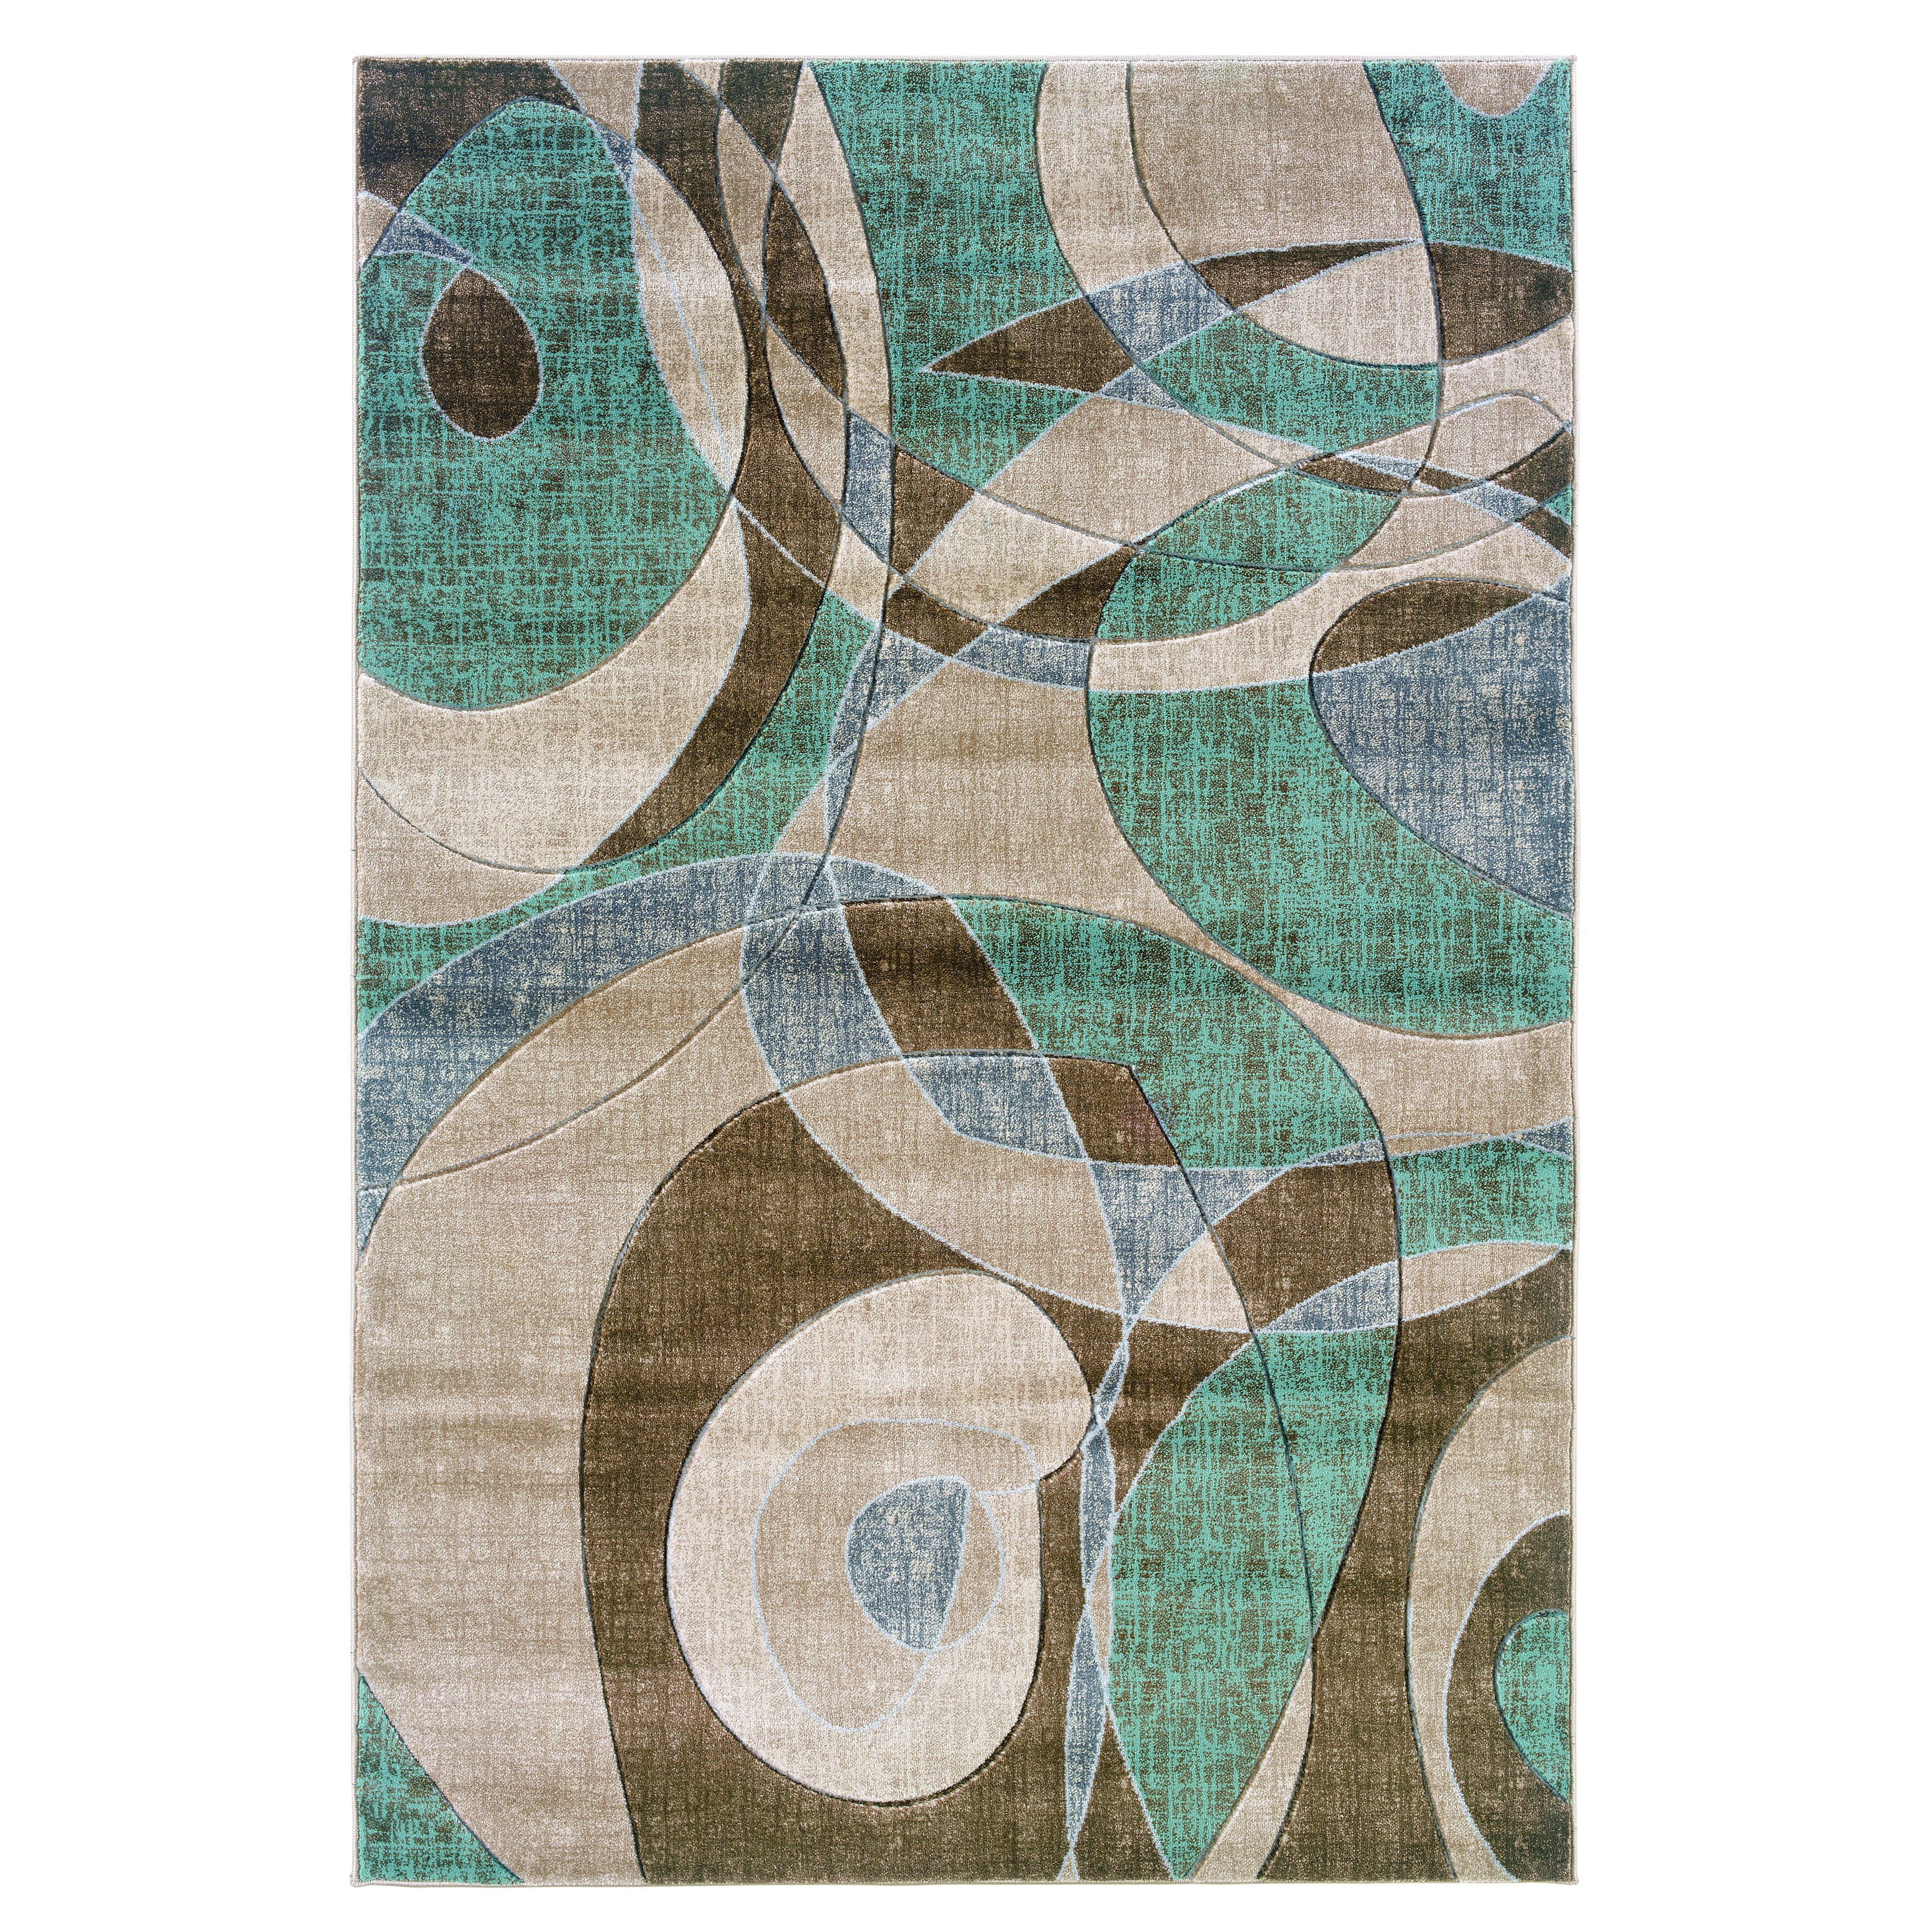 Zoubir Turquoise Area Rug Reviews: Threadbind Dixon Brown/Turquoise Area Rug & Reviews